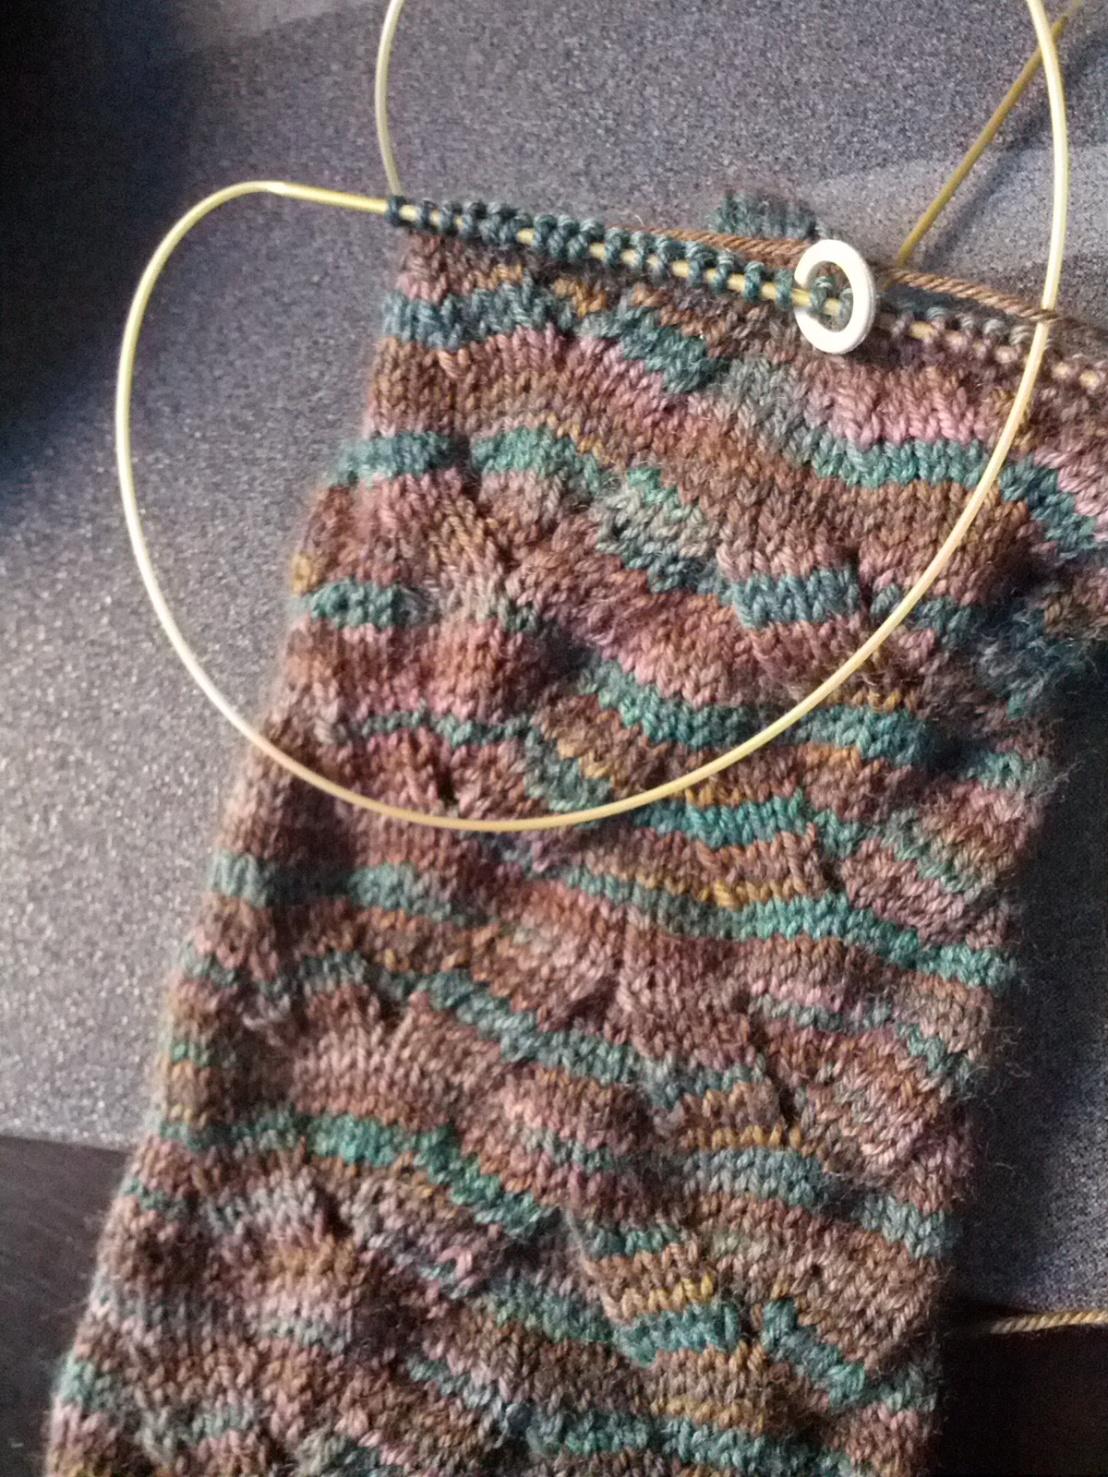 My yarn overs werebackwards!